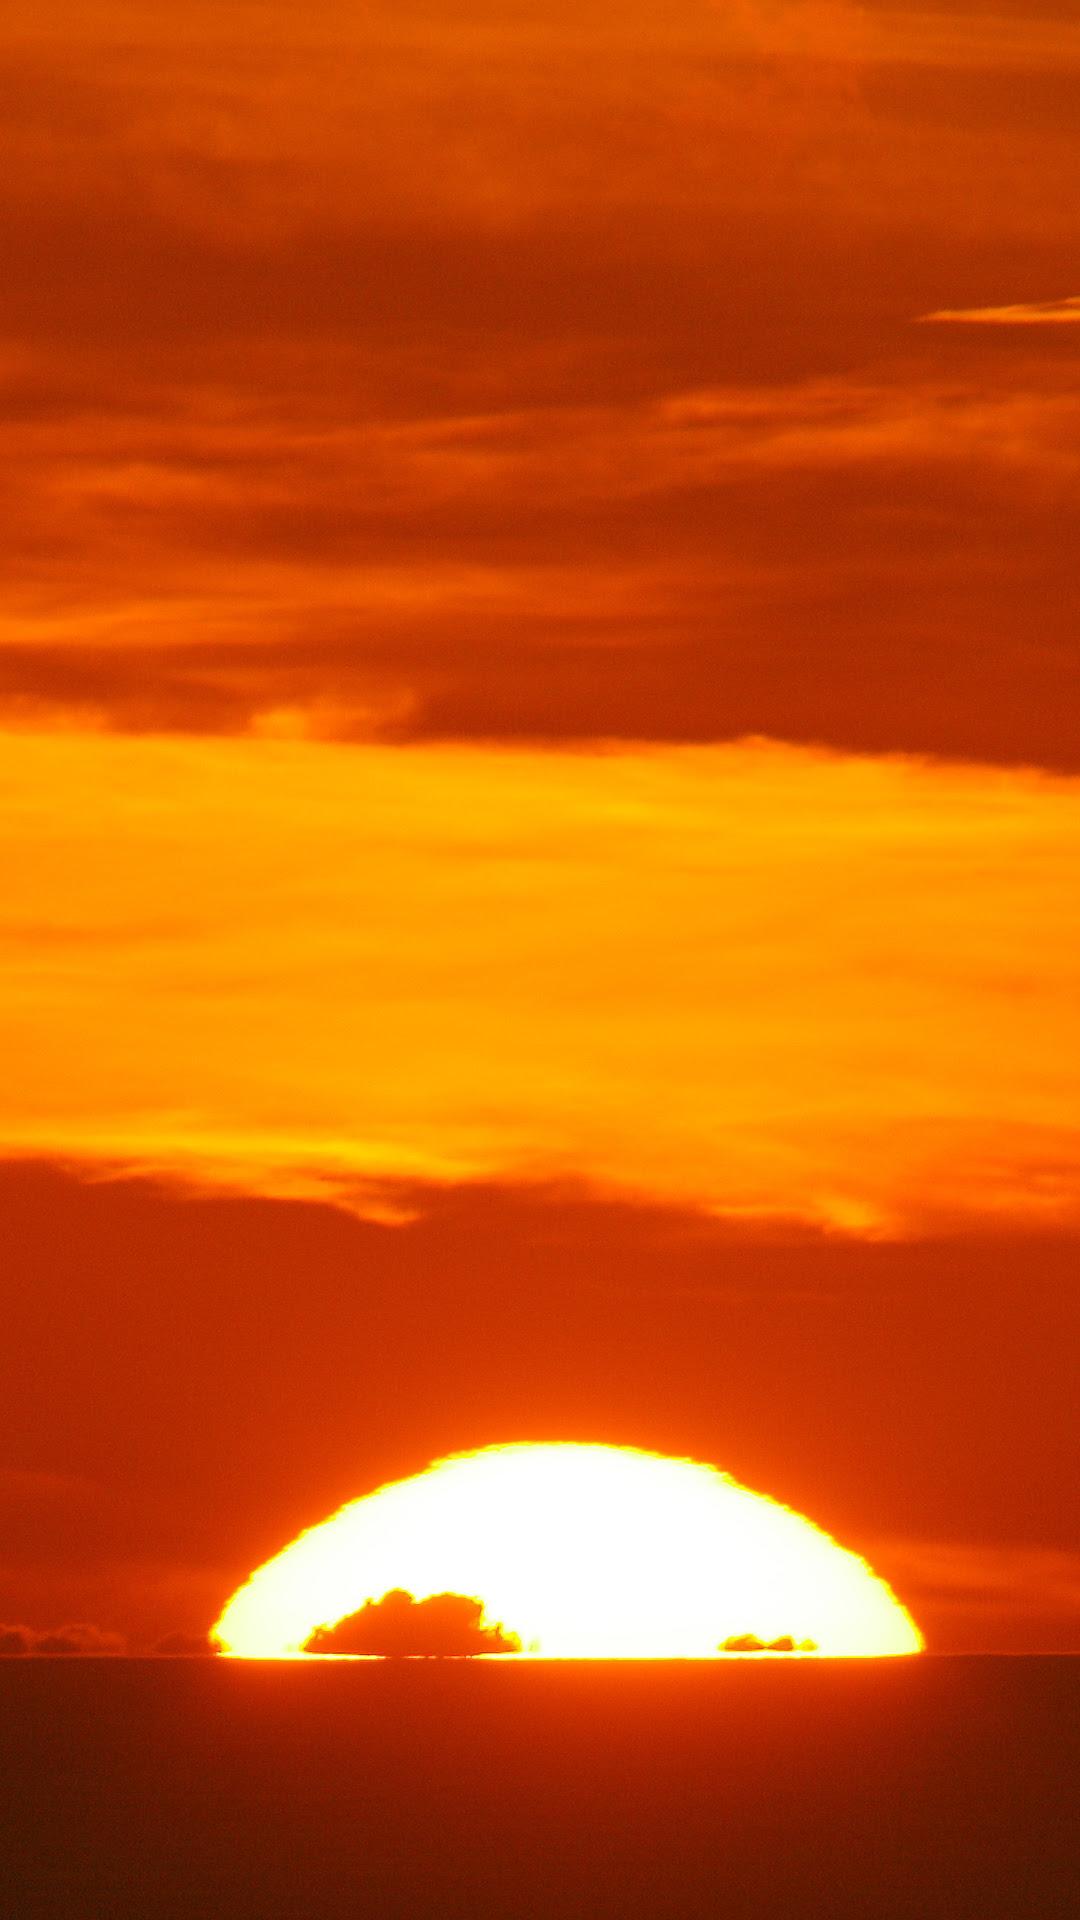 Sunset Orange iPhone Wallpaper HD